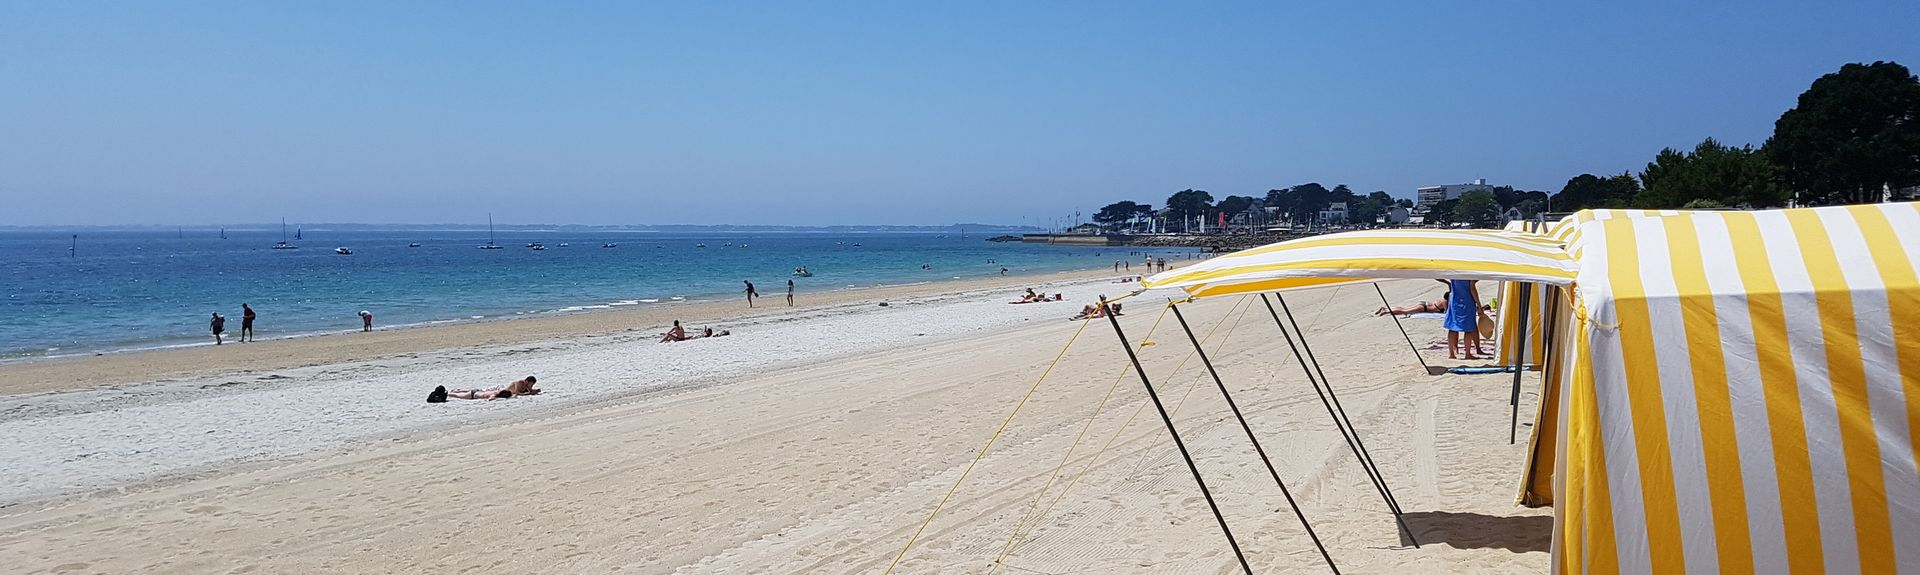 Carnac Beach, Carnac, France